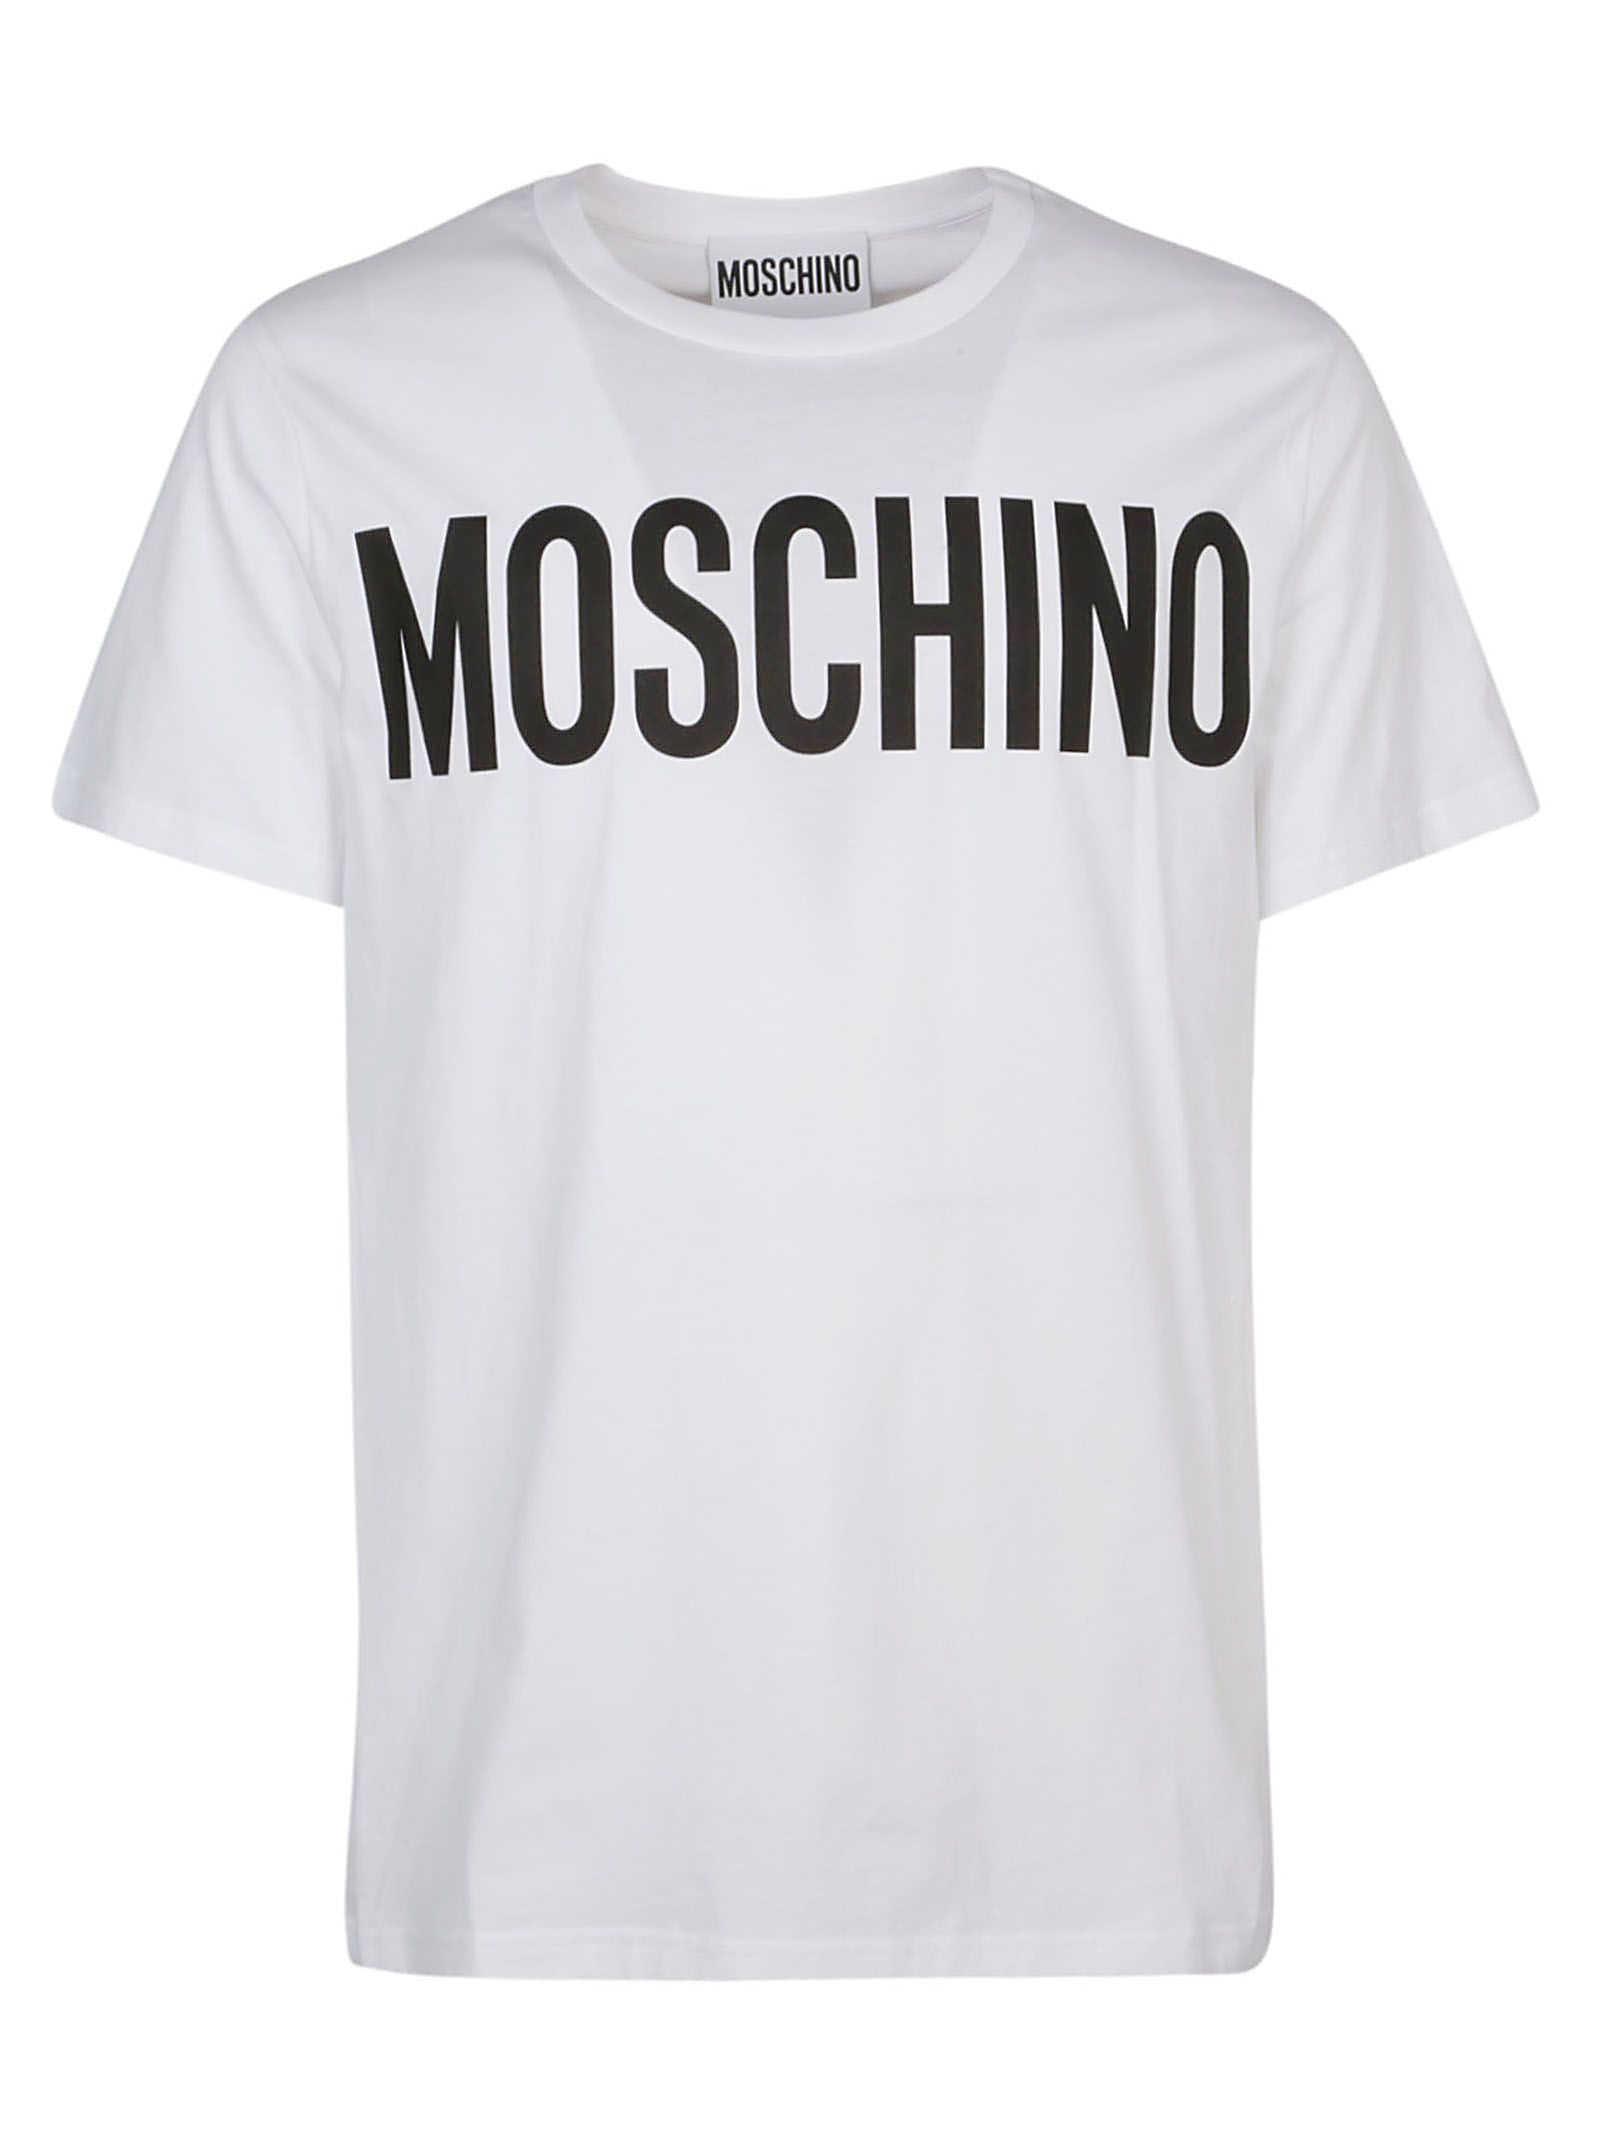 9a7b33ede1a MOSCHINO T-SHIRT.  moschino  cloth